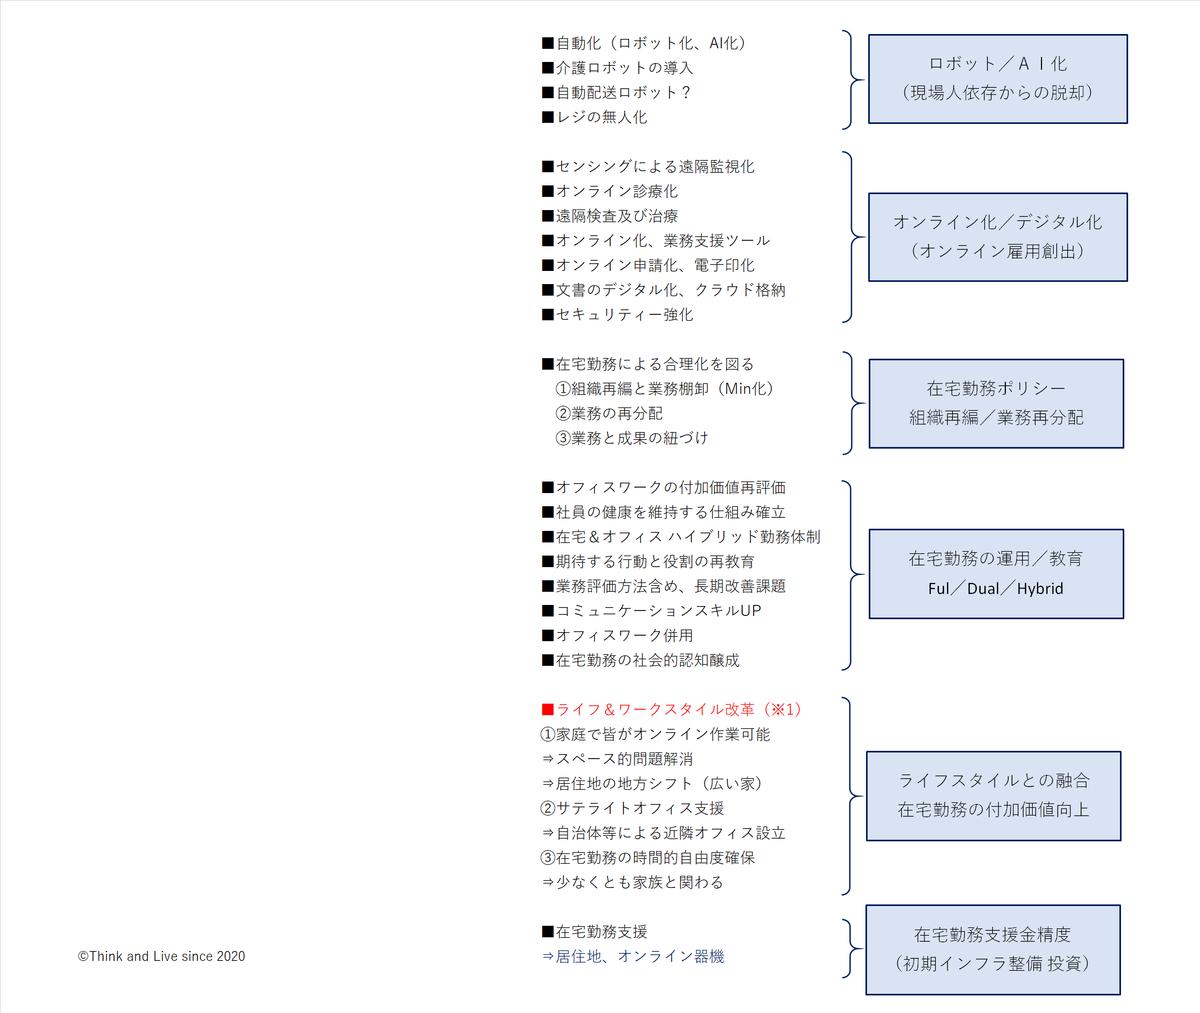 f:id:zuoji319:20200616215312p:plain